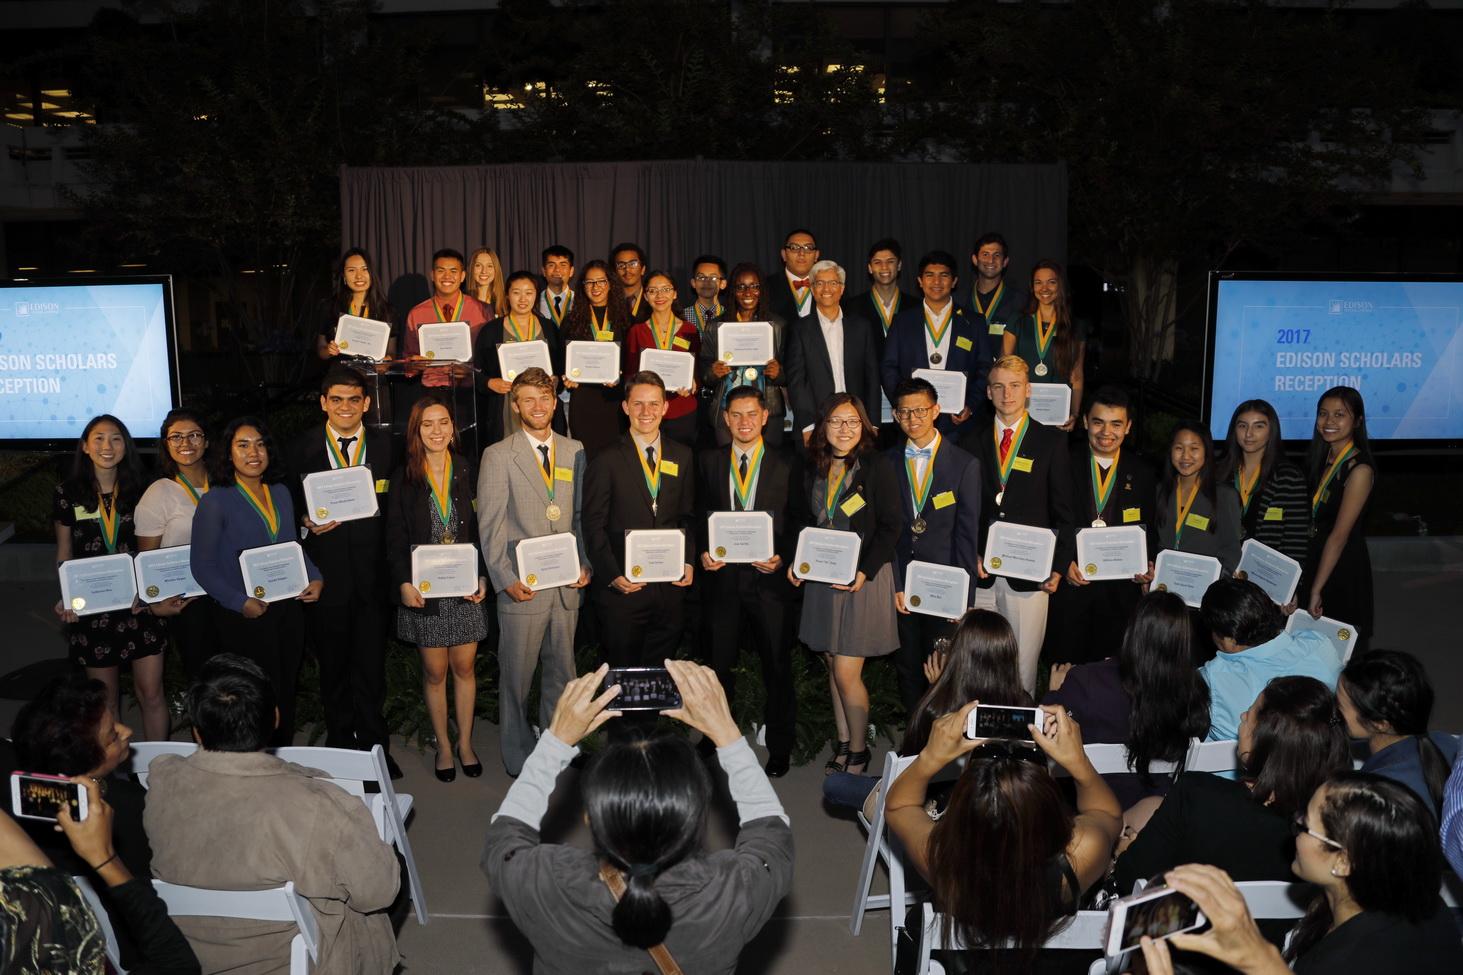 2017 Edison Scholars